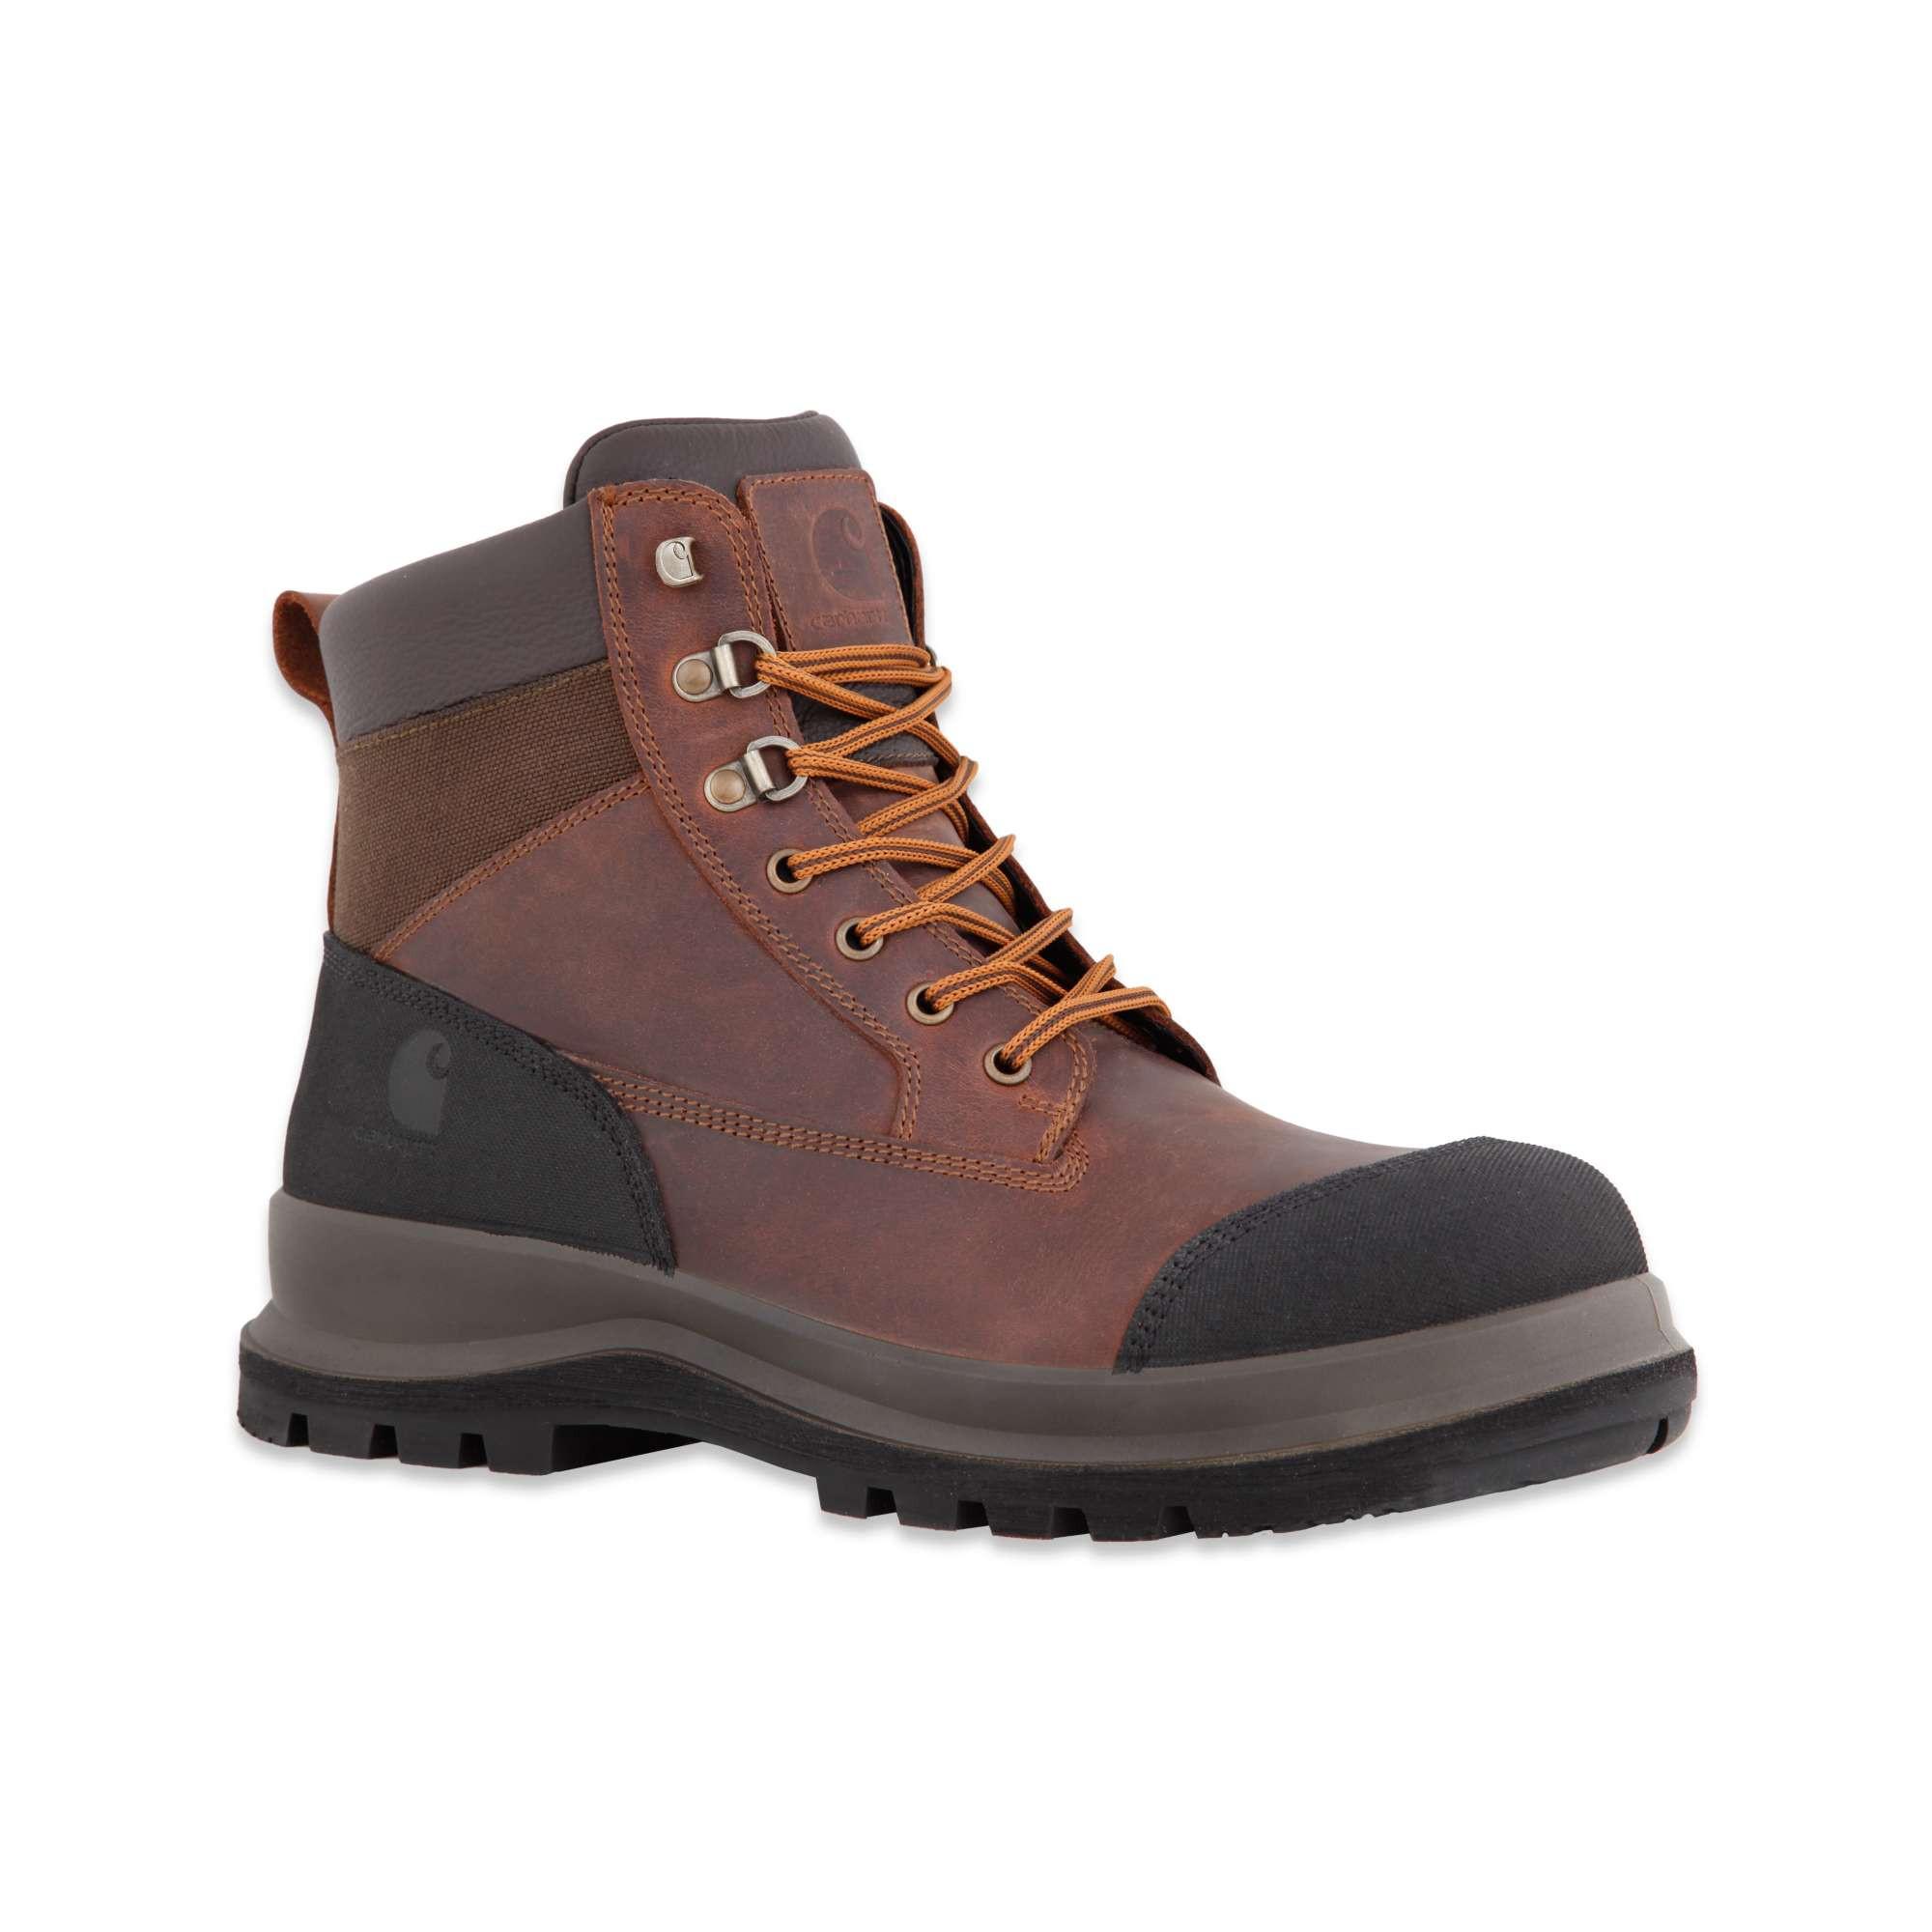 "Ботинки Carhartt Detroit 6"" S3 Work Boot - F702903 (Dark Brown, 41)"